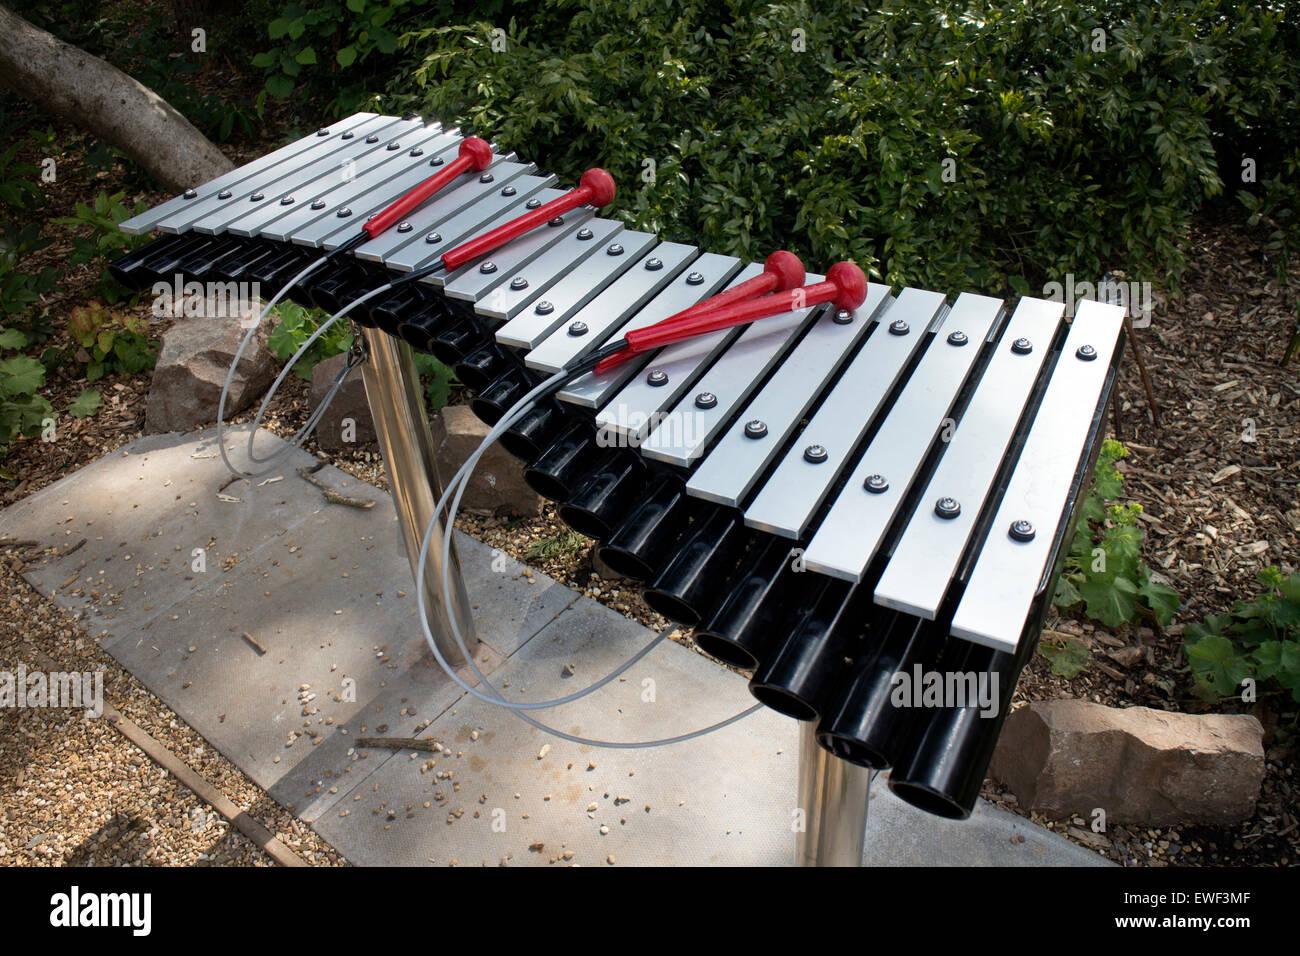 Xylophone In The Sensory Garden, Jephson Gardens, Leamington Spa, UK